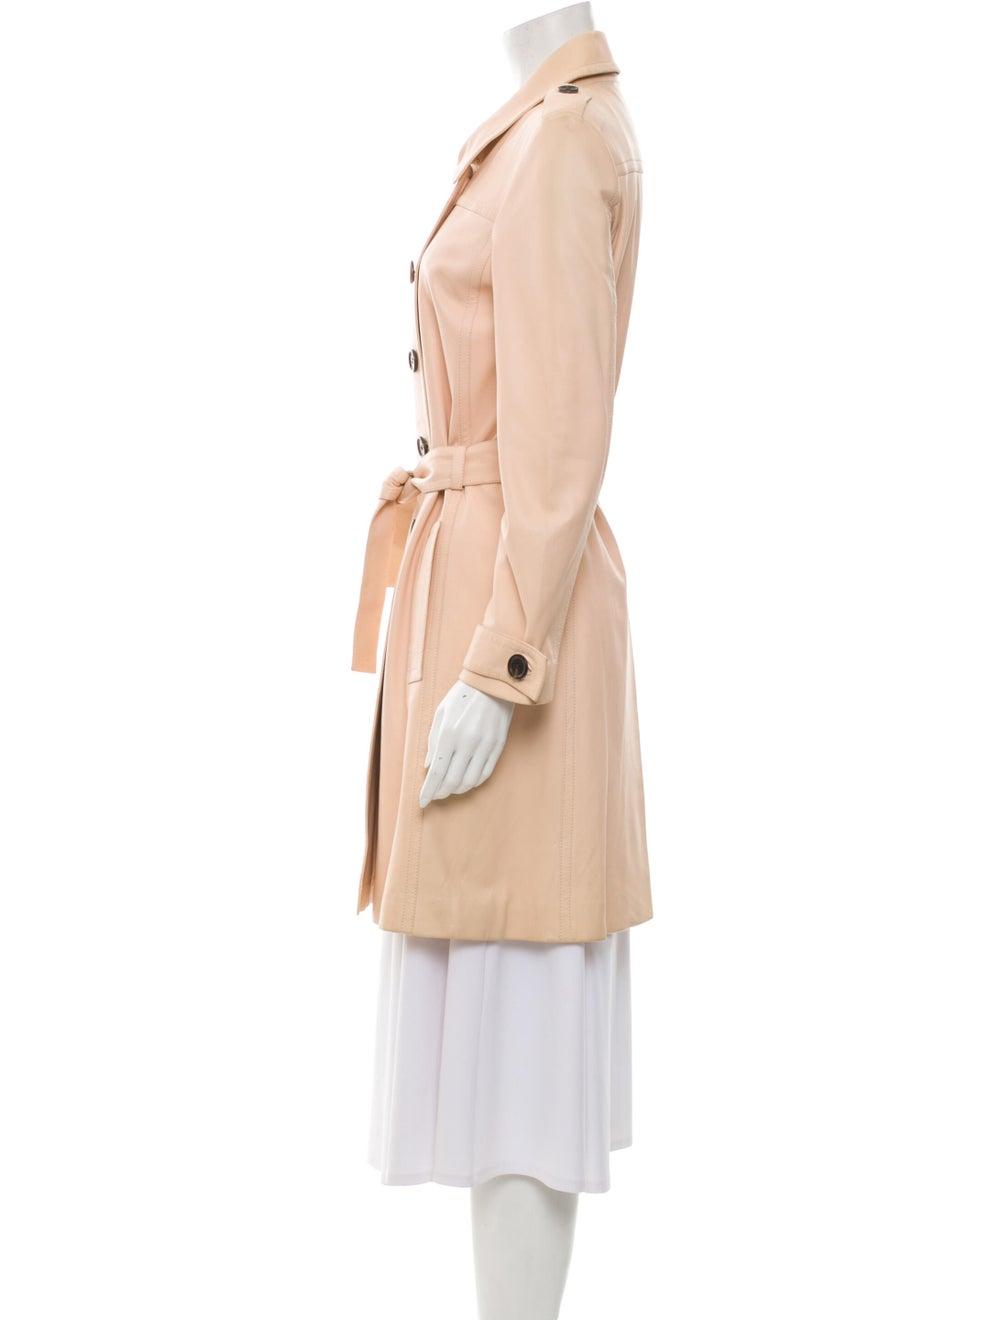 Celine Lamb Leather Trench Coat - image 2